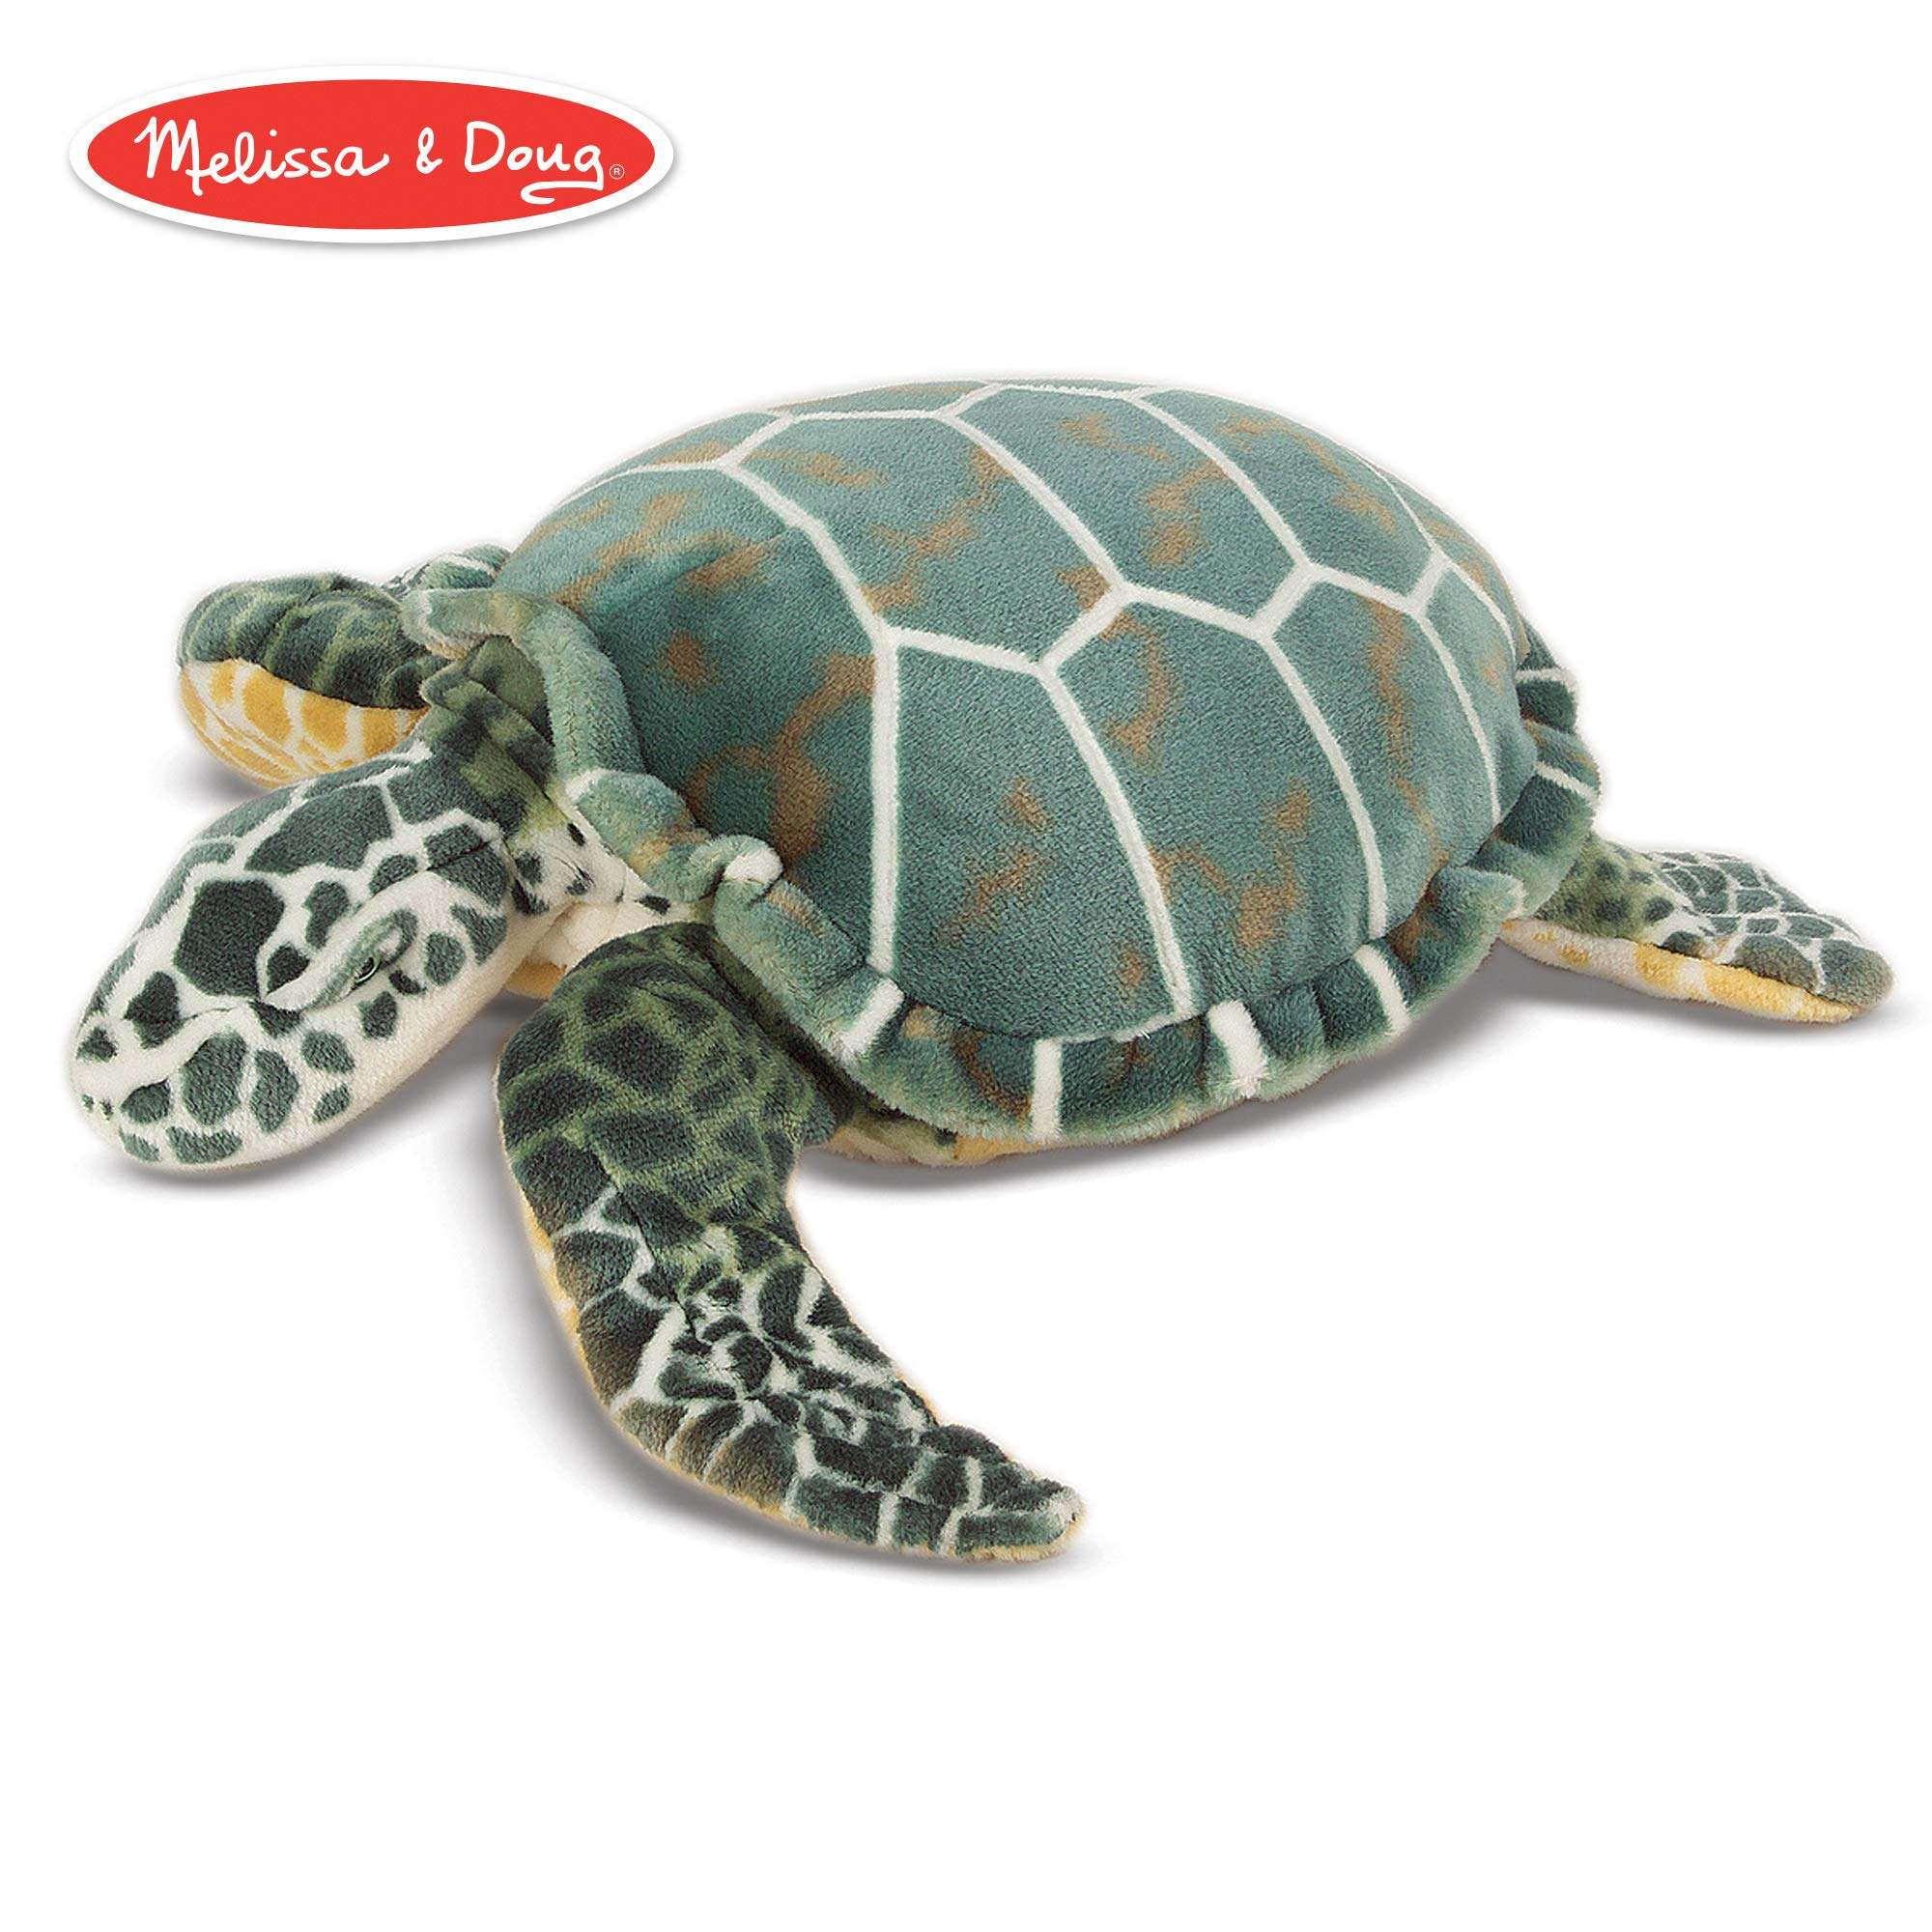 Melissa & Doug Sea Turtle Giant Stuffed Animal (Wildlife, Soft Polyester Fabric, Beautiful Sea Turtle Markings, 24″ H × 22″ W × 7.9″ L) by Melissa & Doug